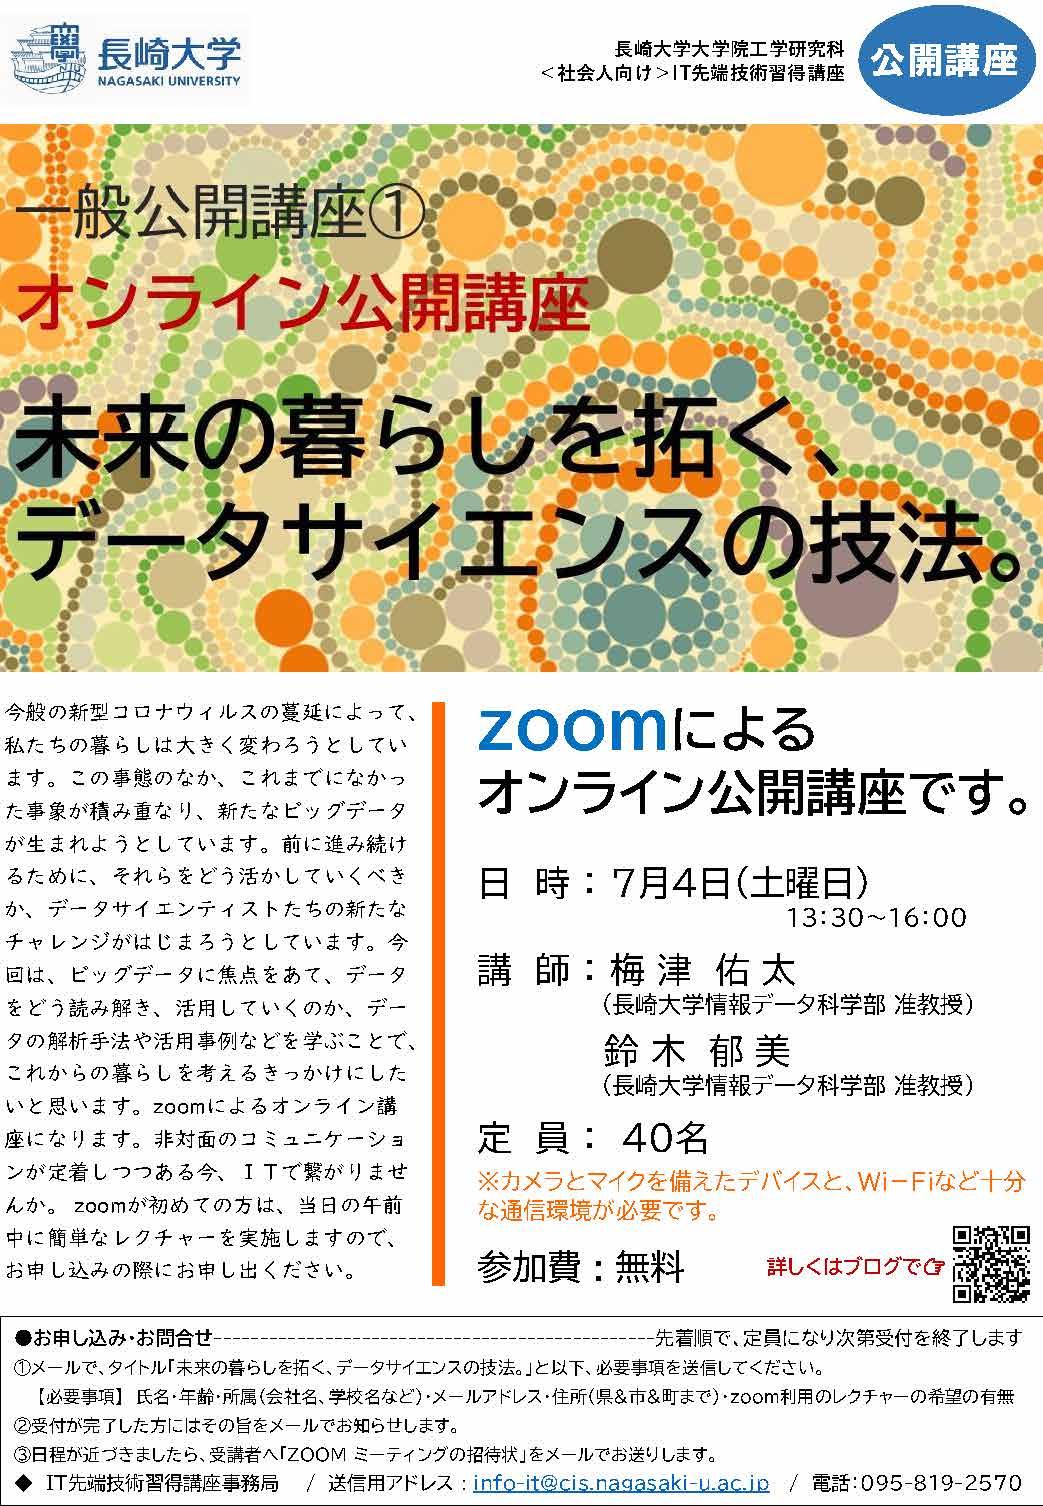 zoomオンライン講座「未来の暮らしを拓く、データサイエンスの技法」